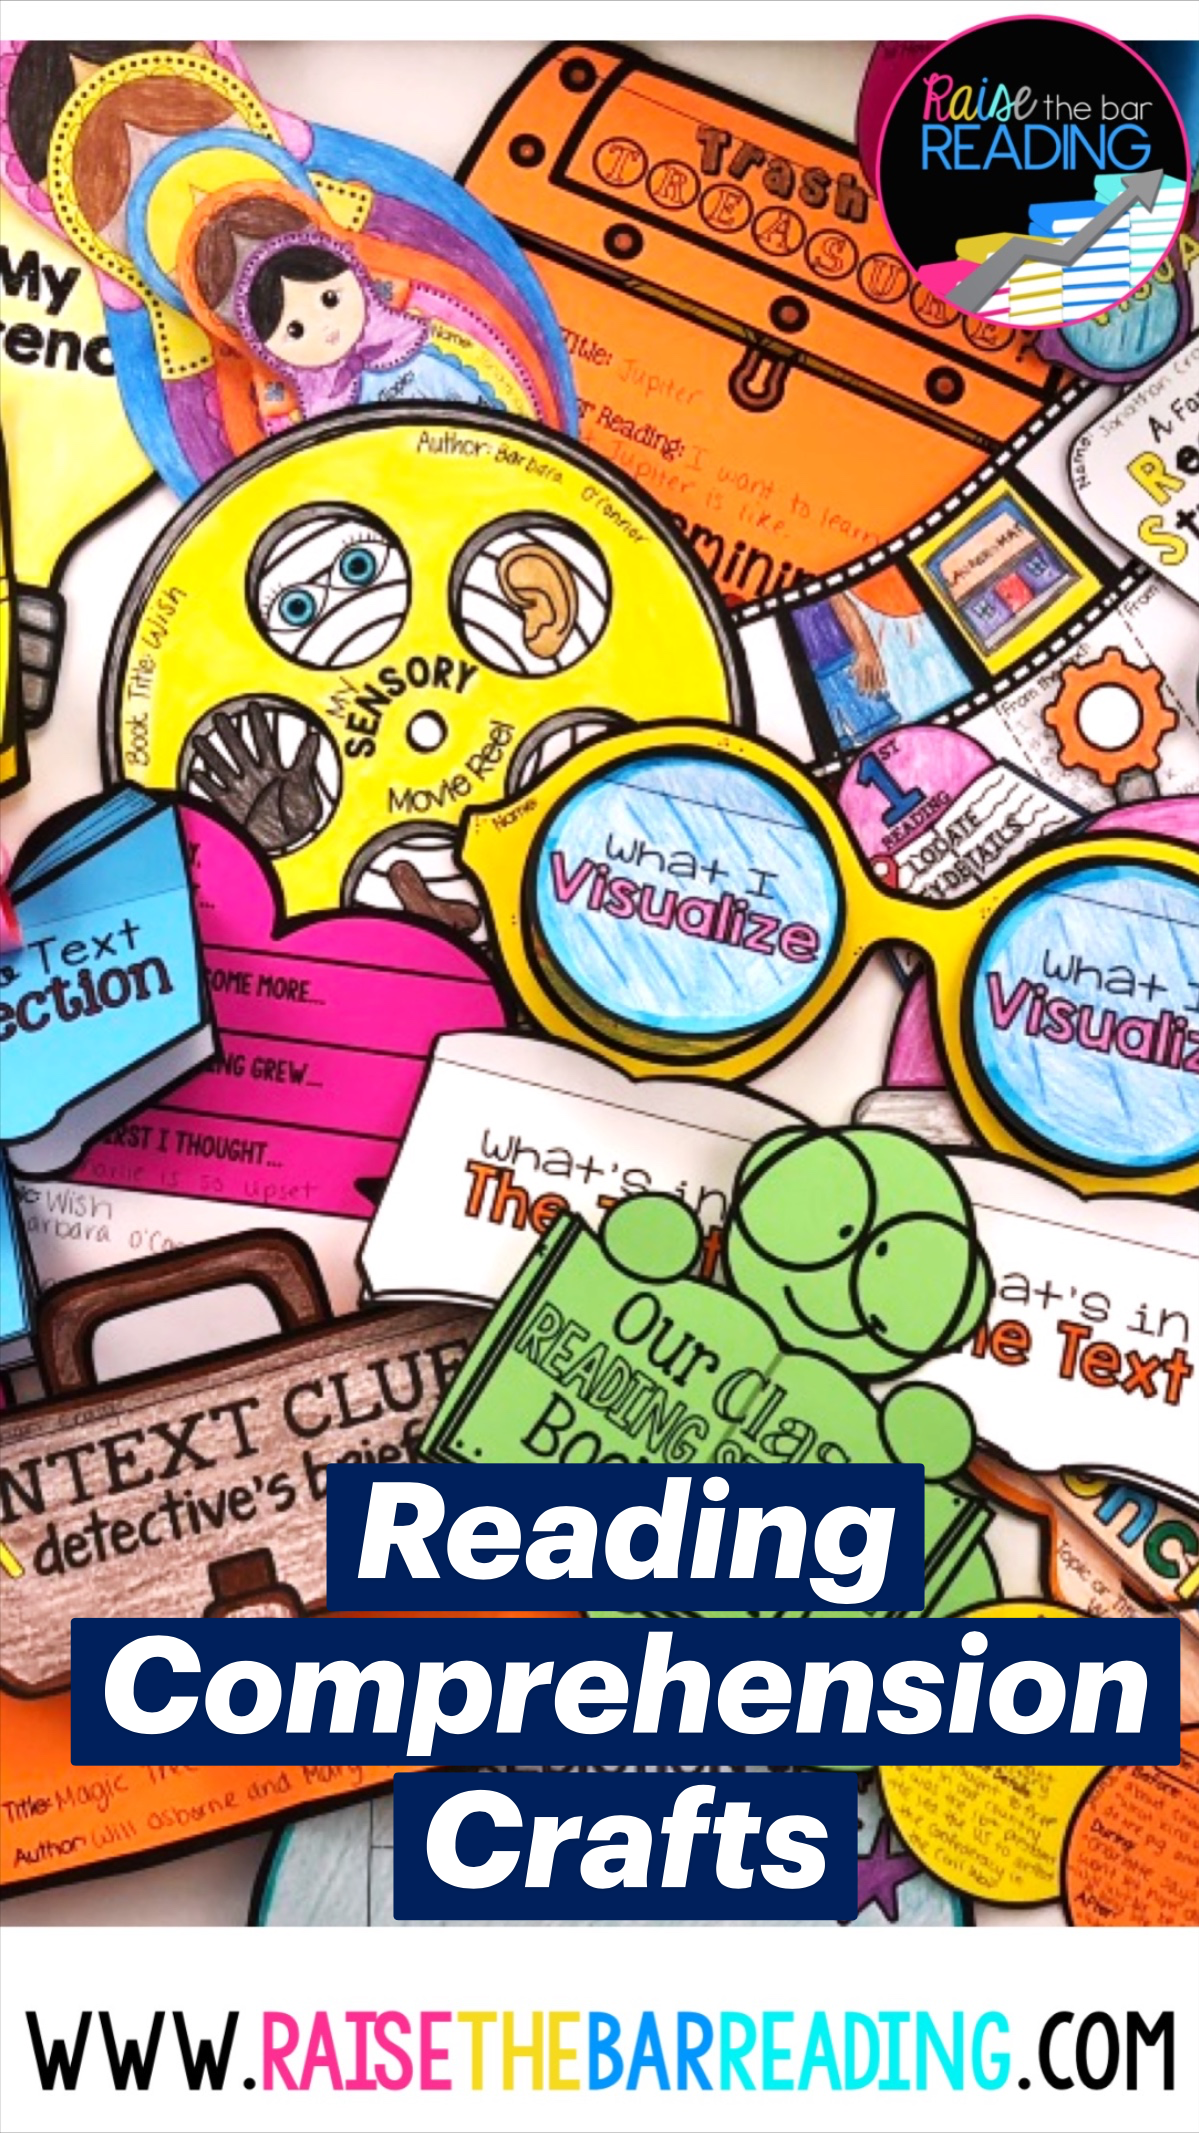 Reading ComprehensionCrafts